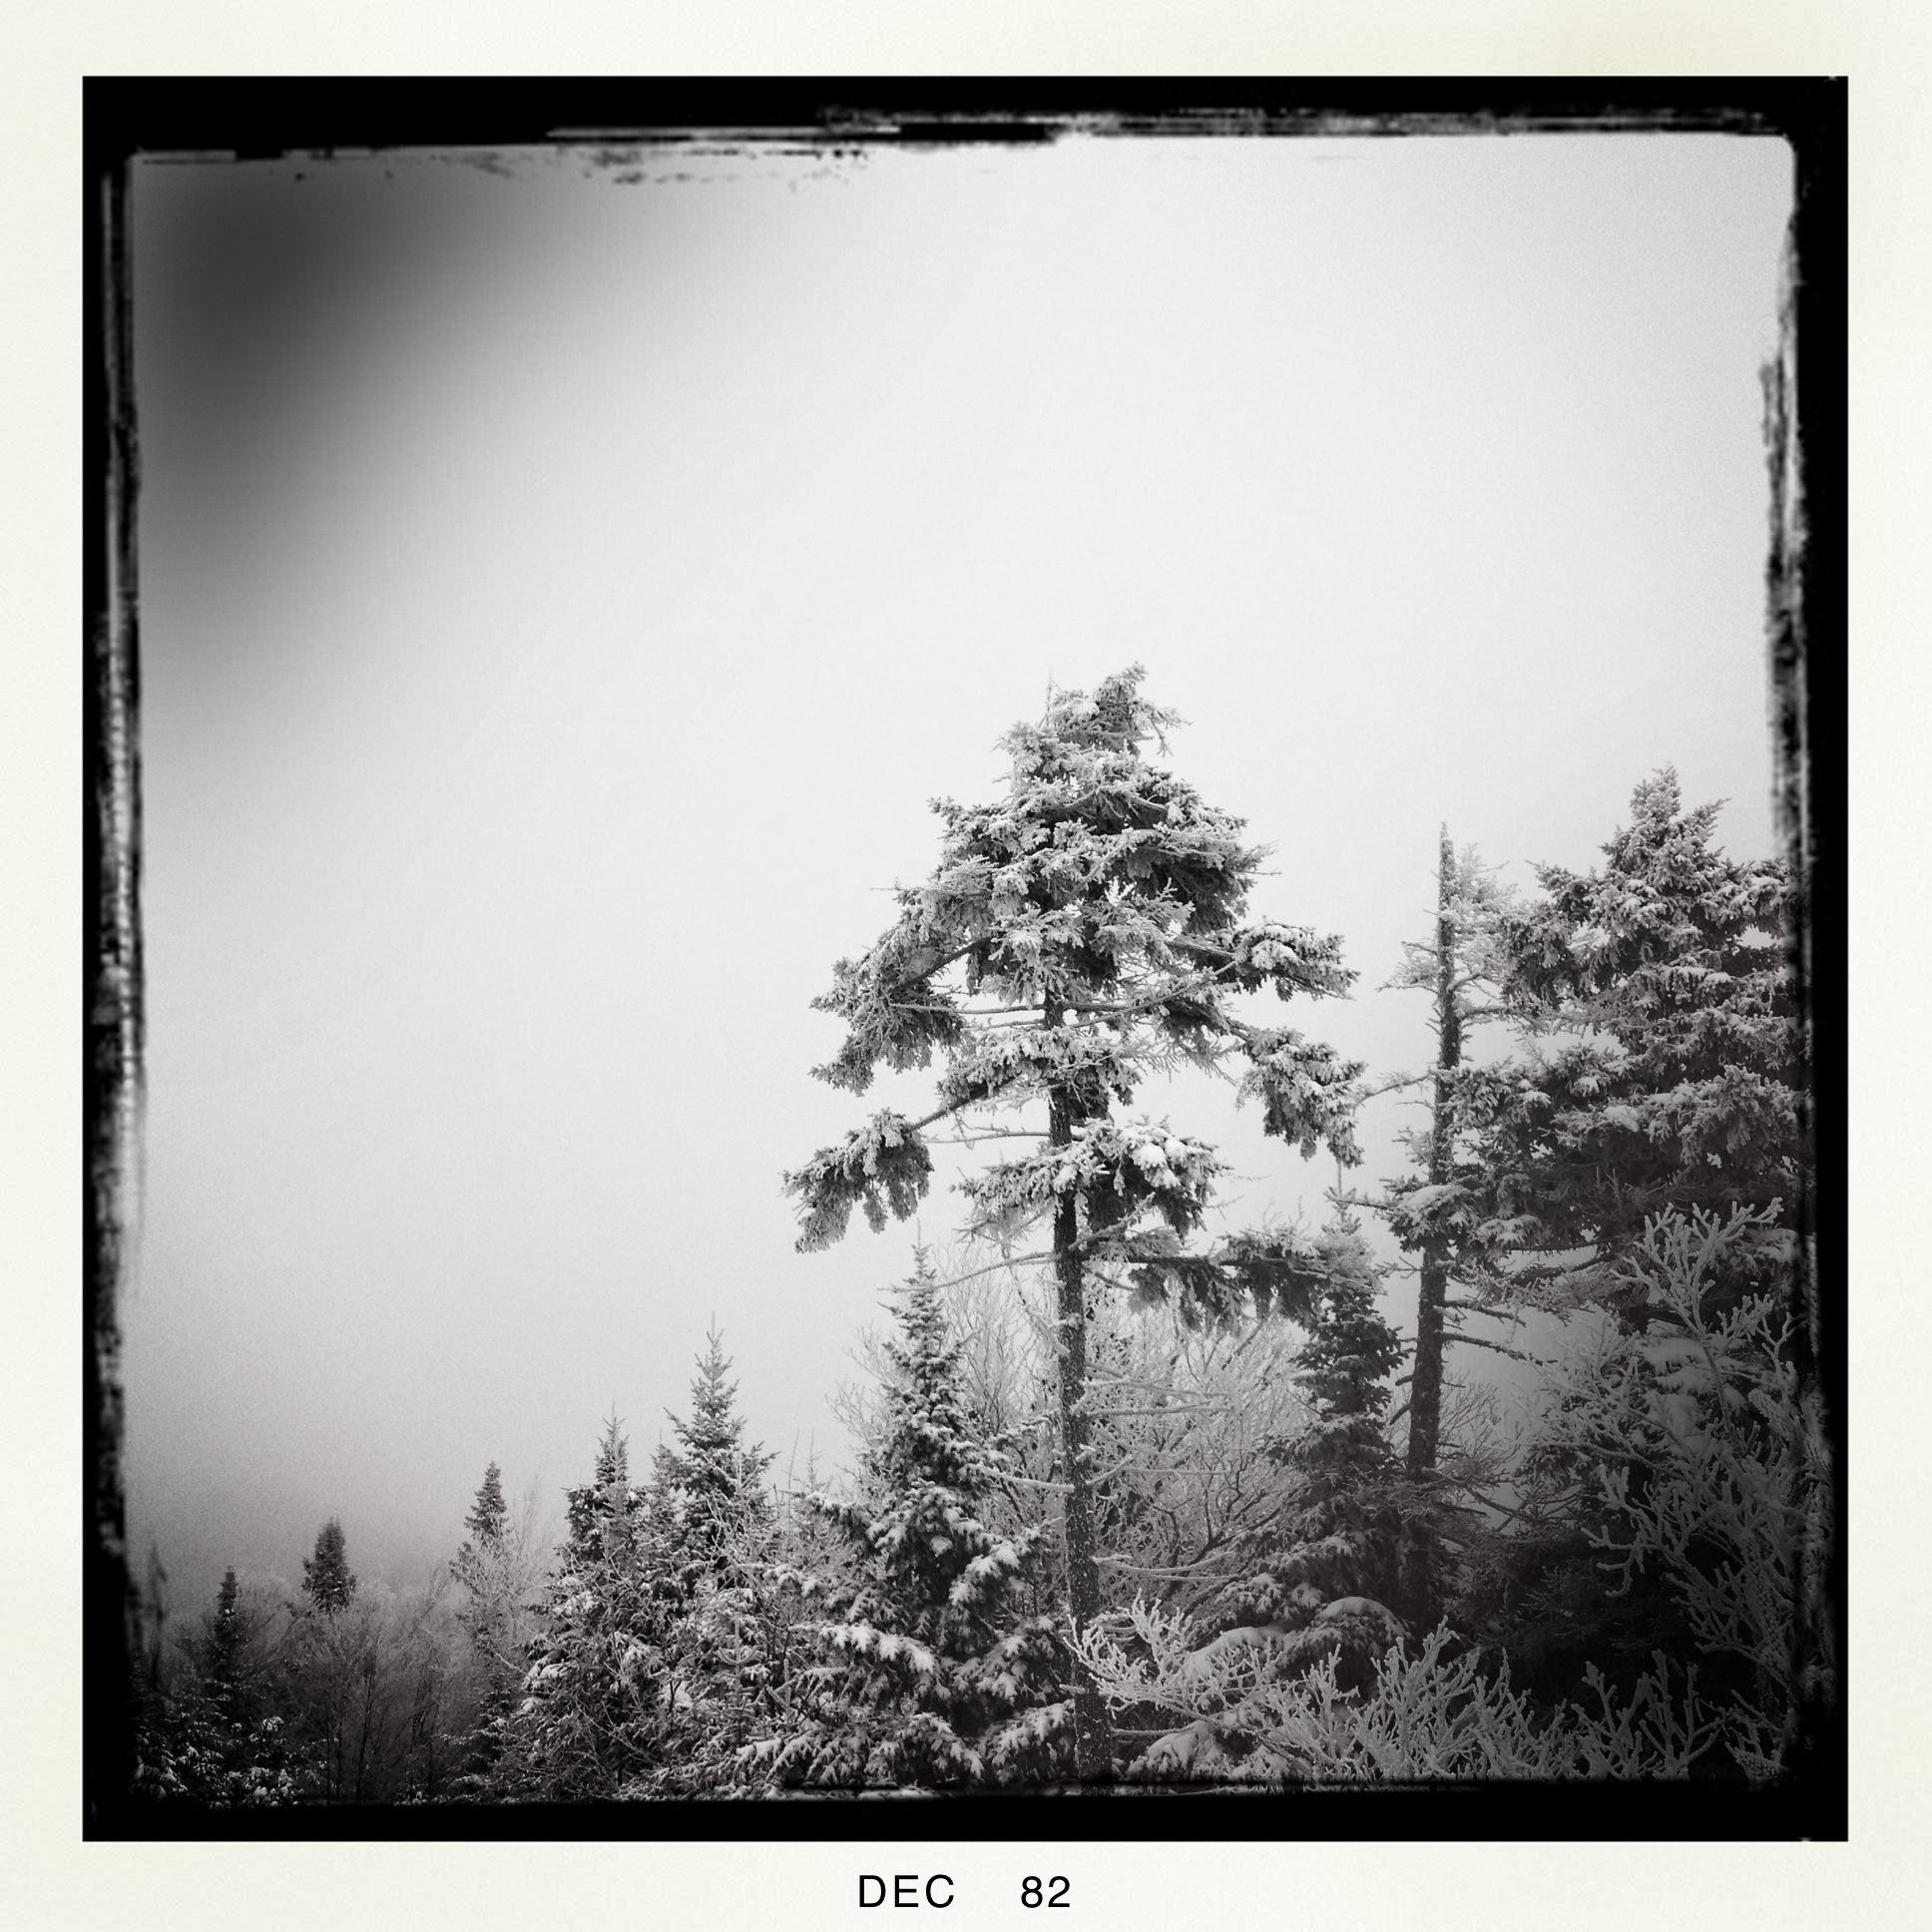 Stowe Winter Scene 1